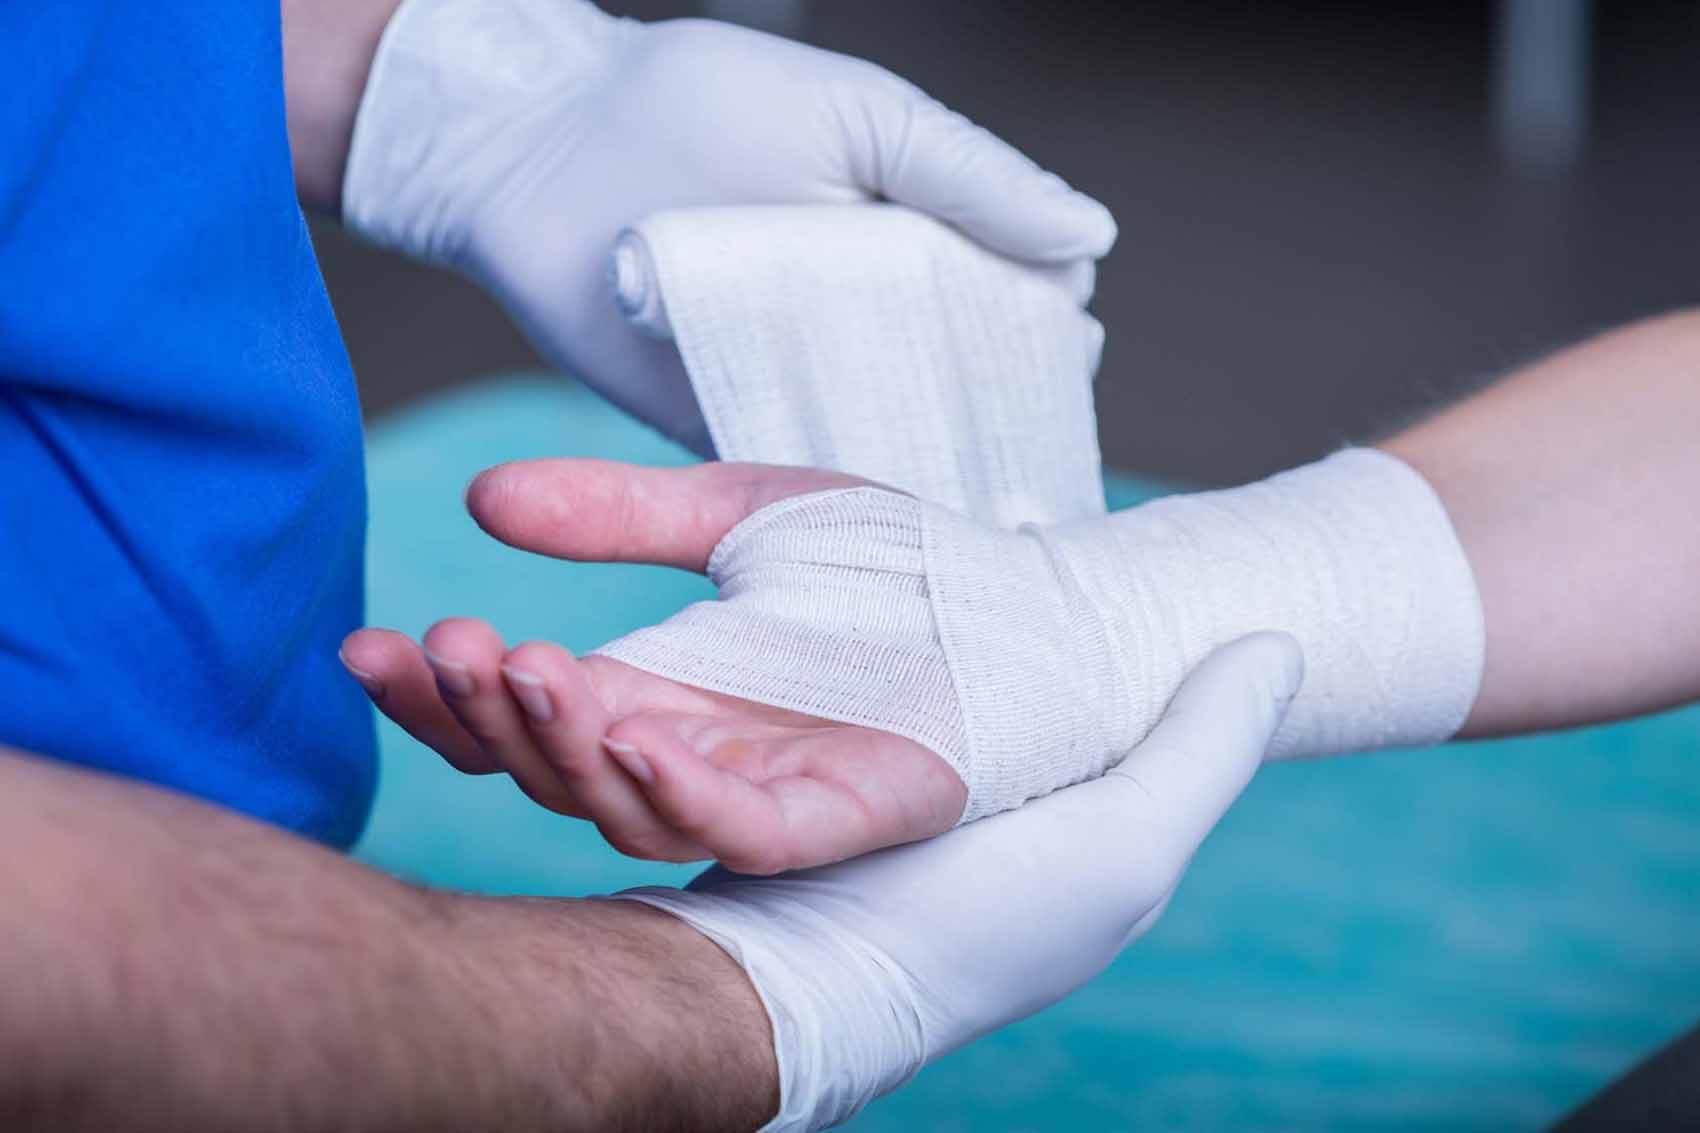 Handchirurgie